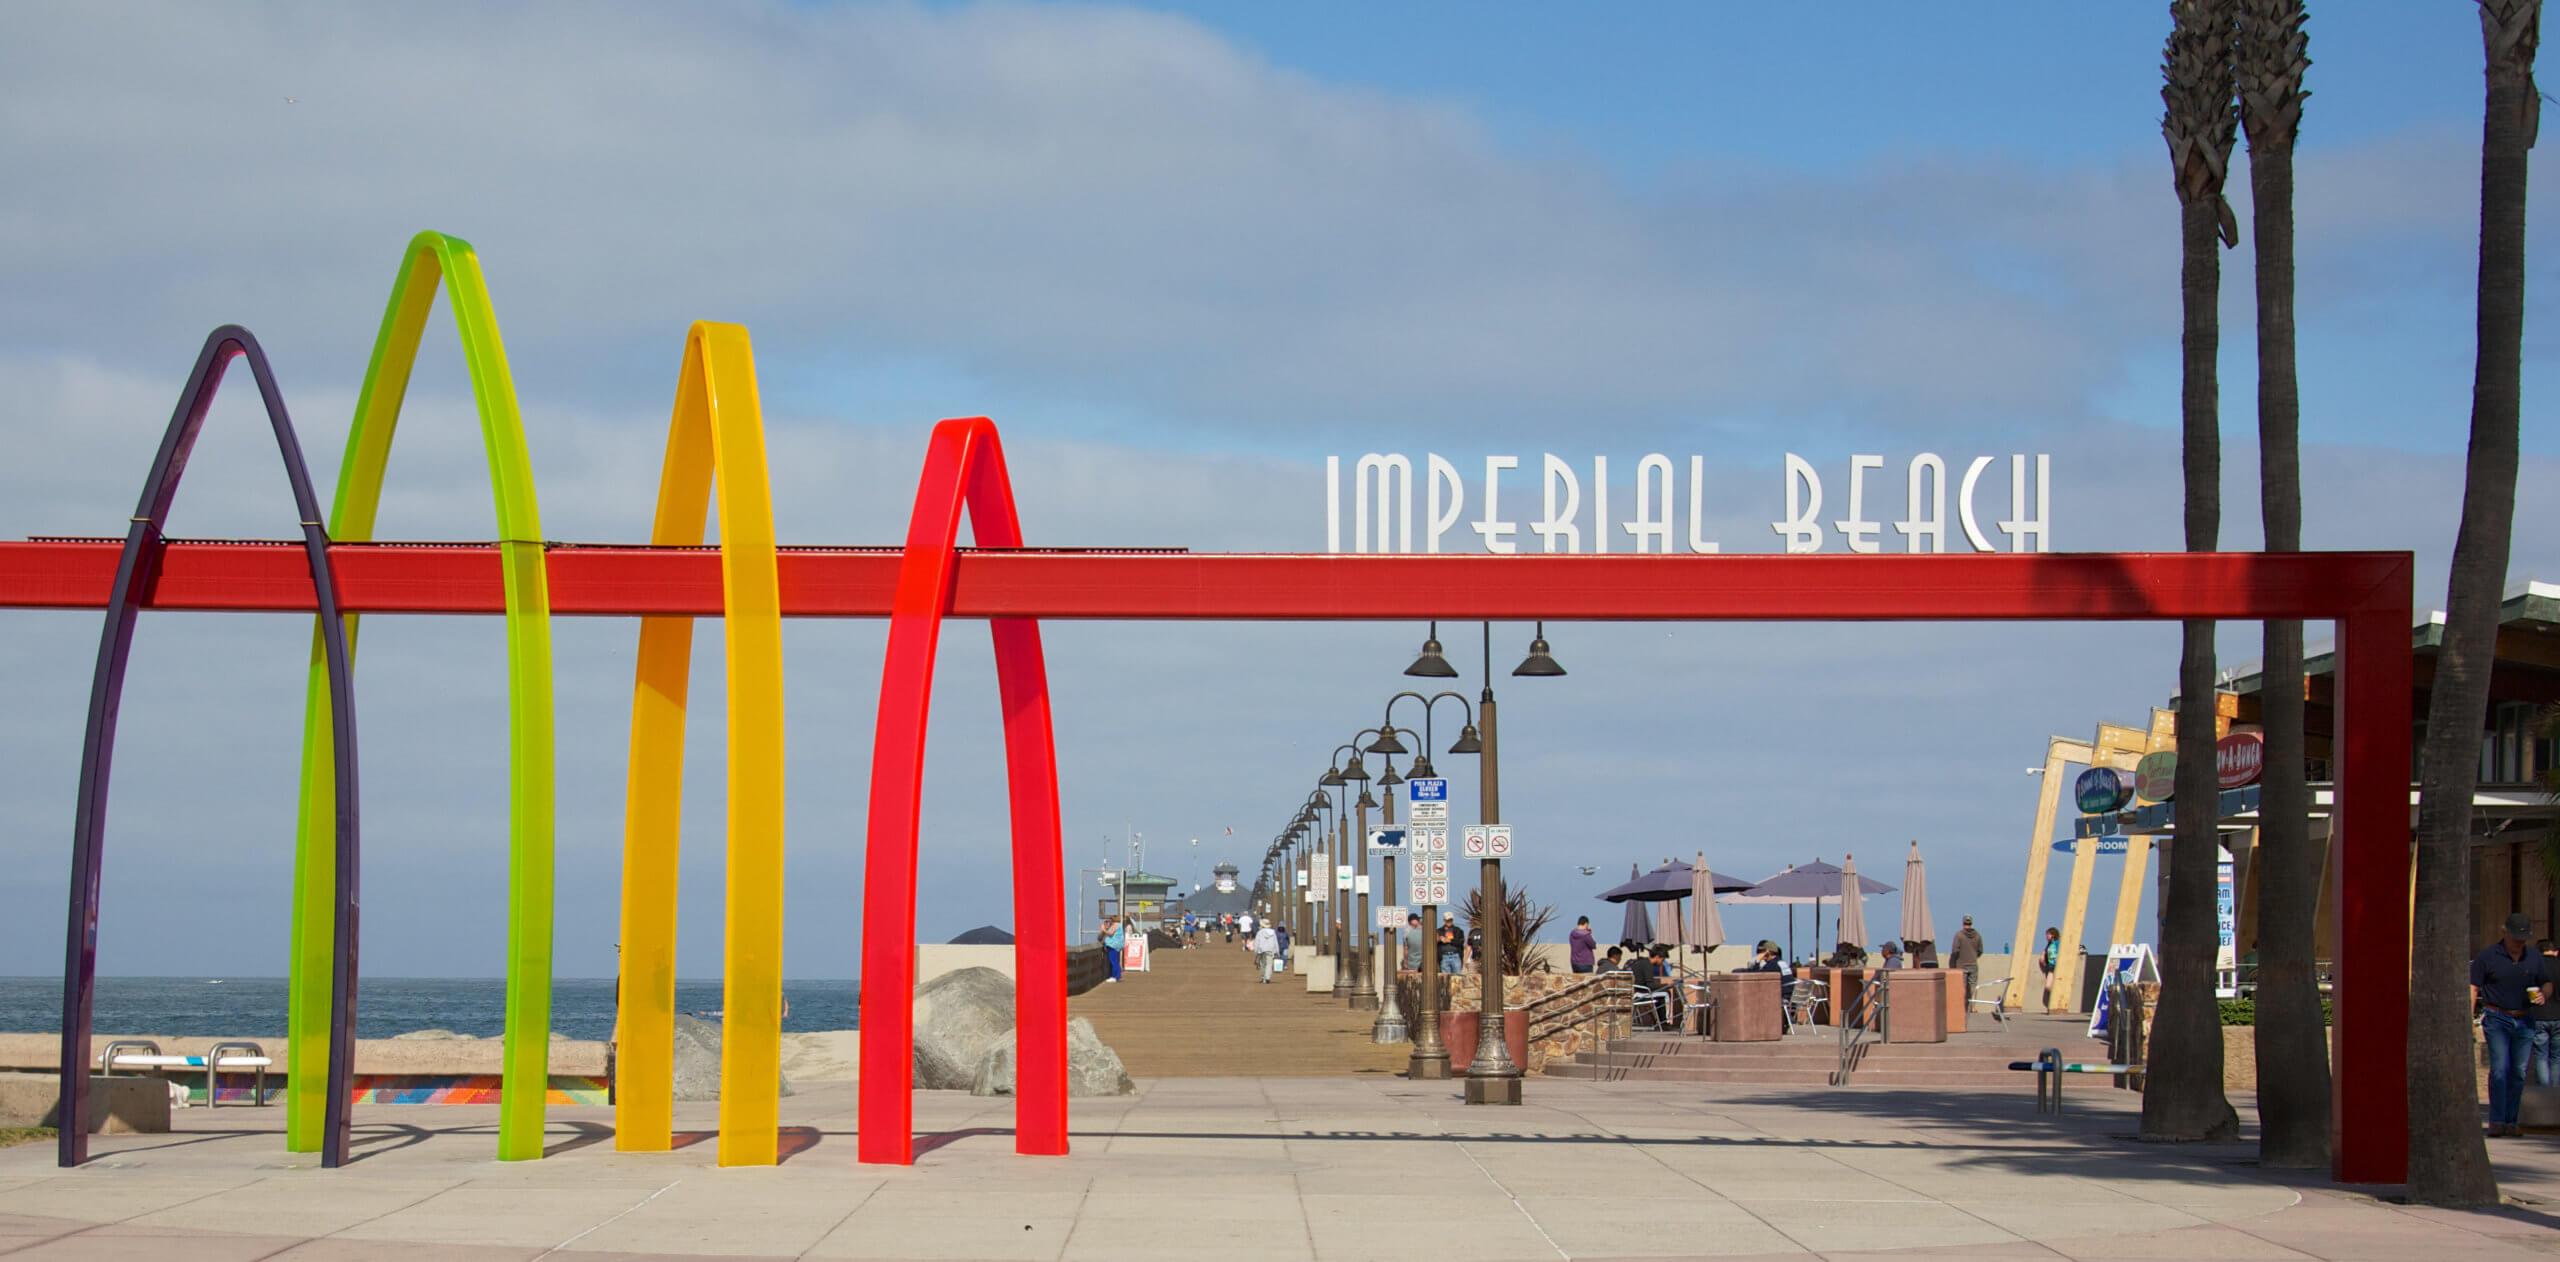 Imperial Beach approves marijuana ordinance